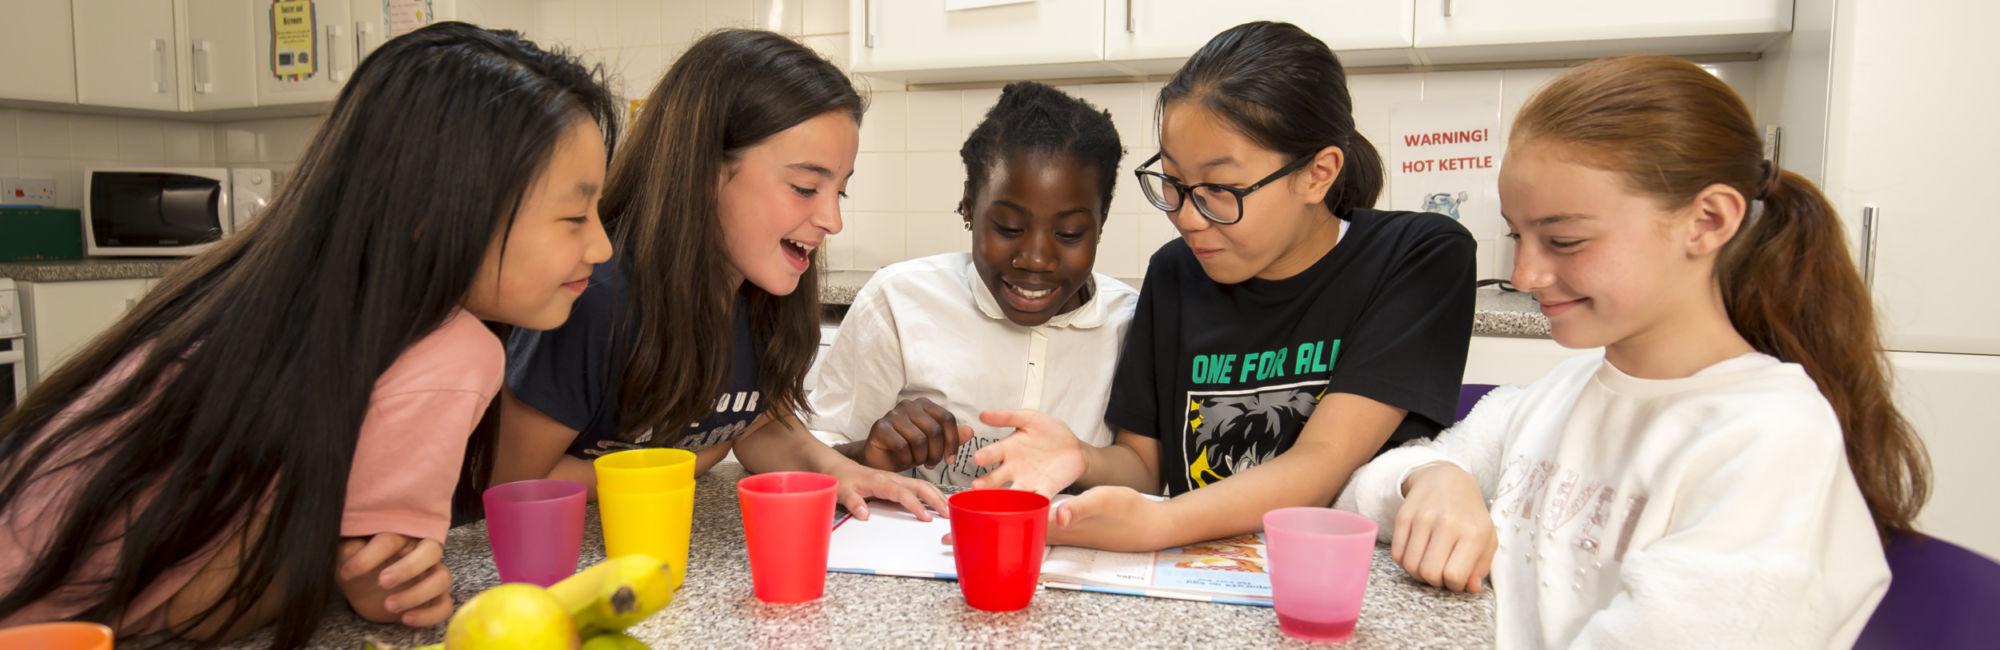 International Girls boarding house kitchen